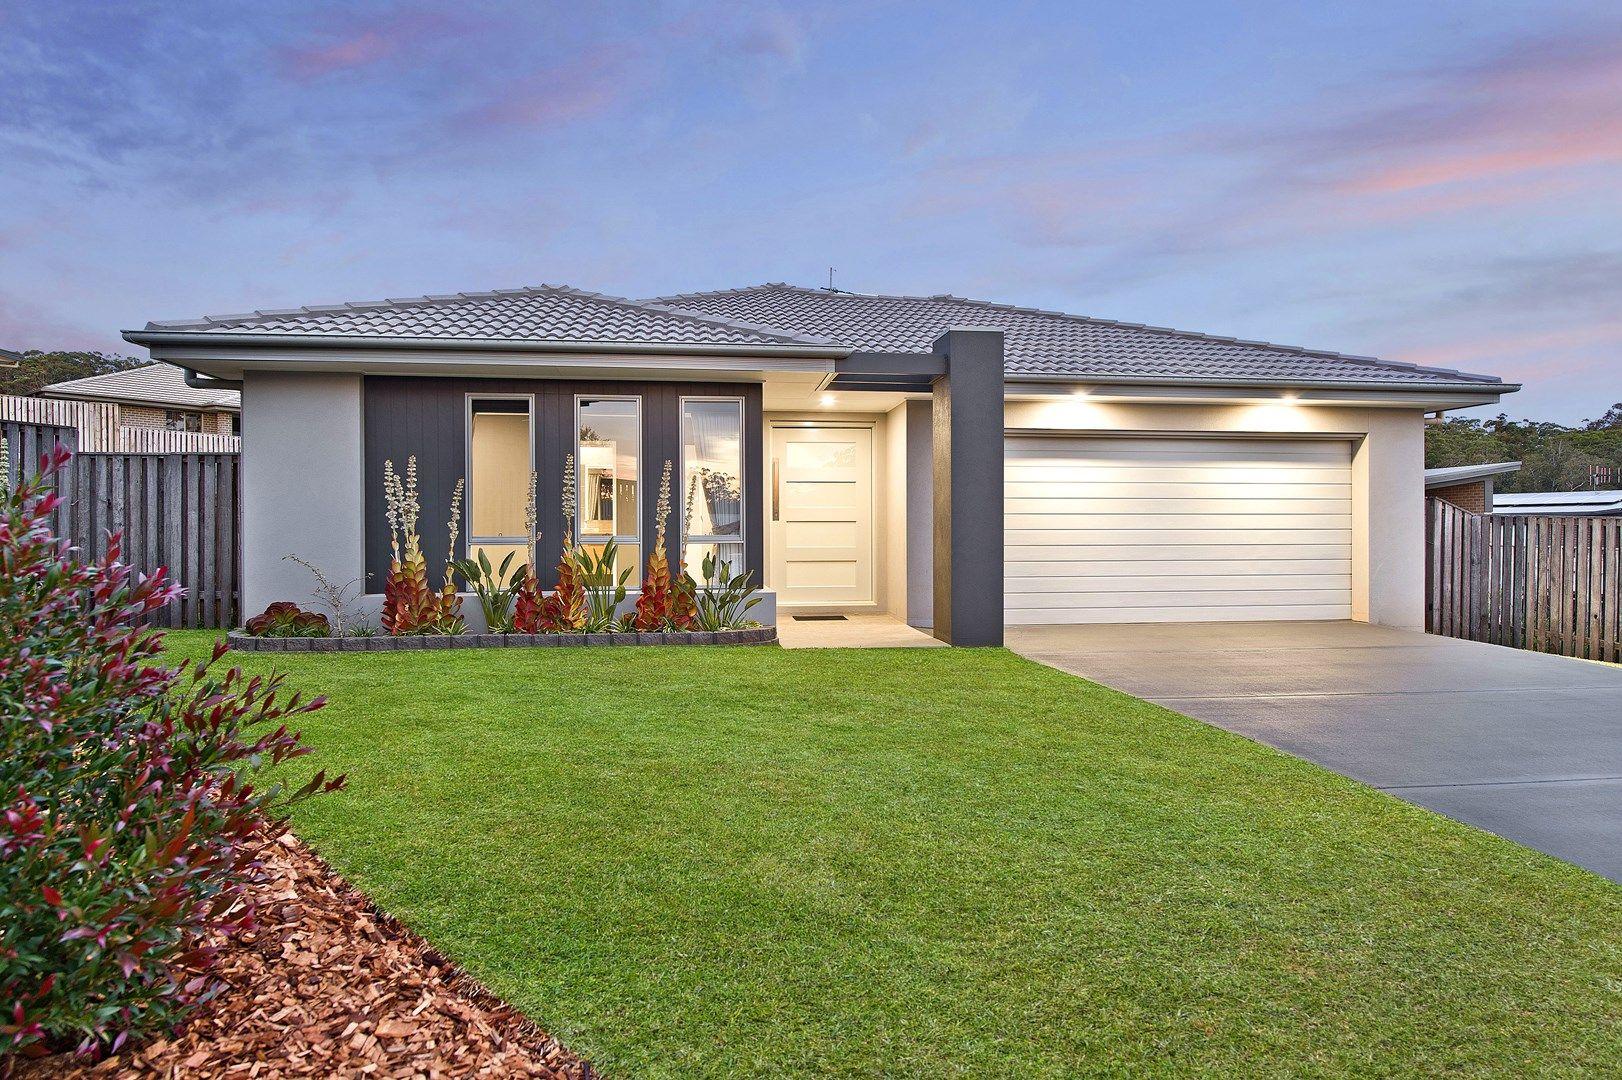 26 Ferrous Close, Port Macquarie NSW 2444, Image 0